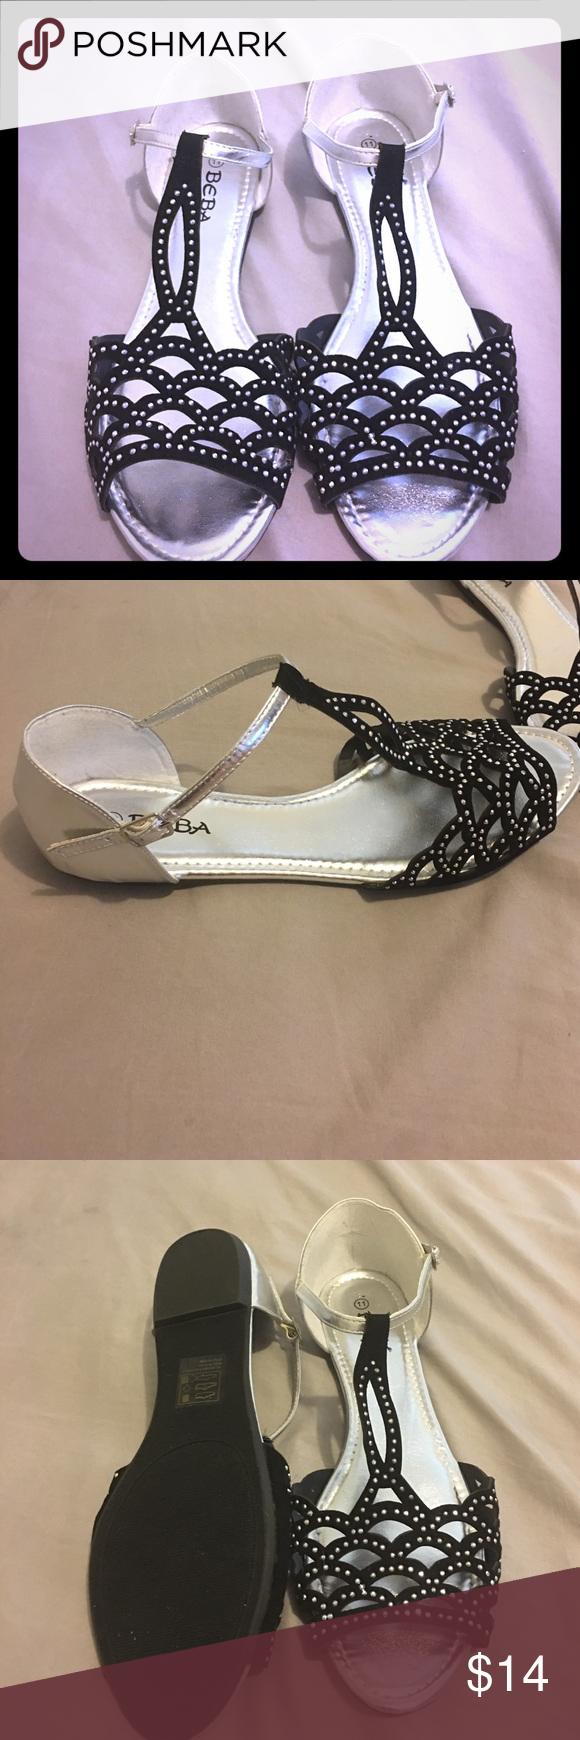 Black sandals size 11 -  New Beba Sandal Size 11 Nwt